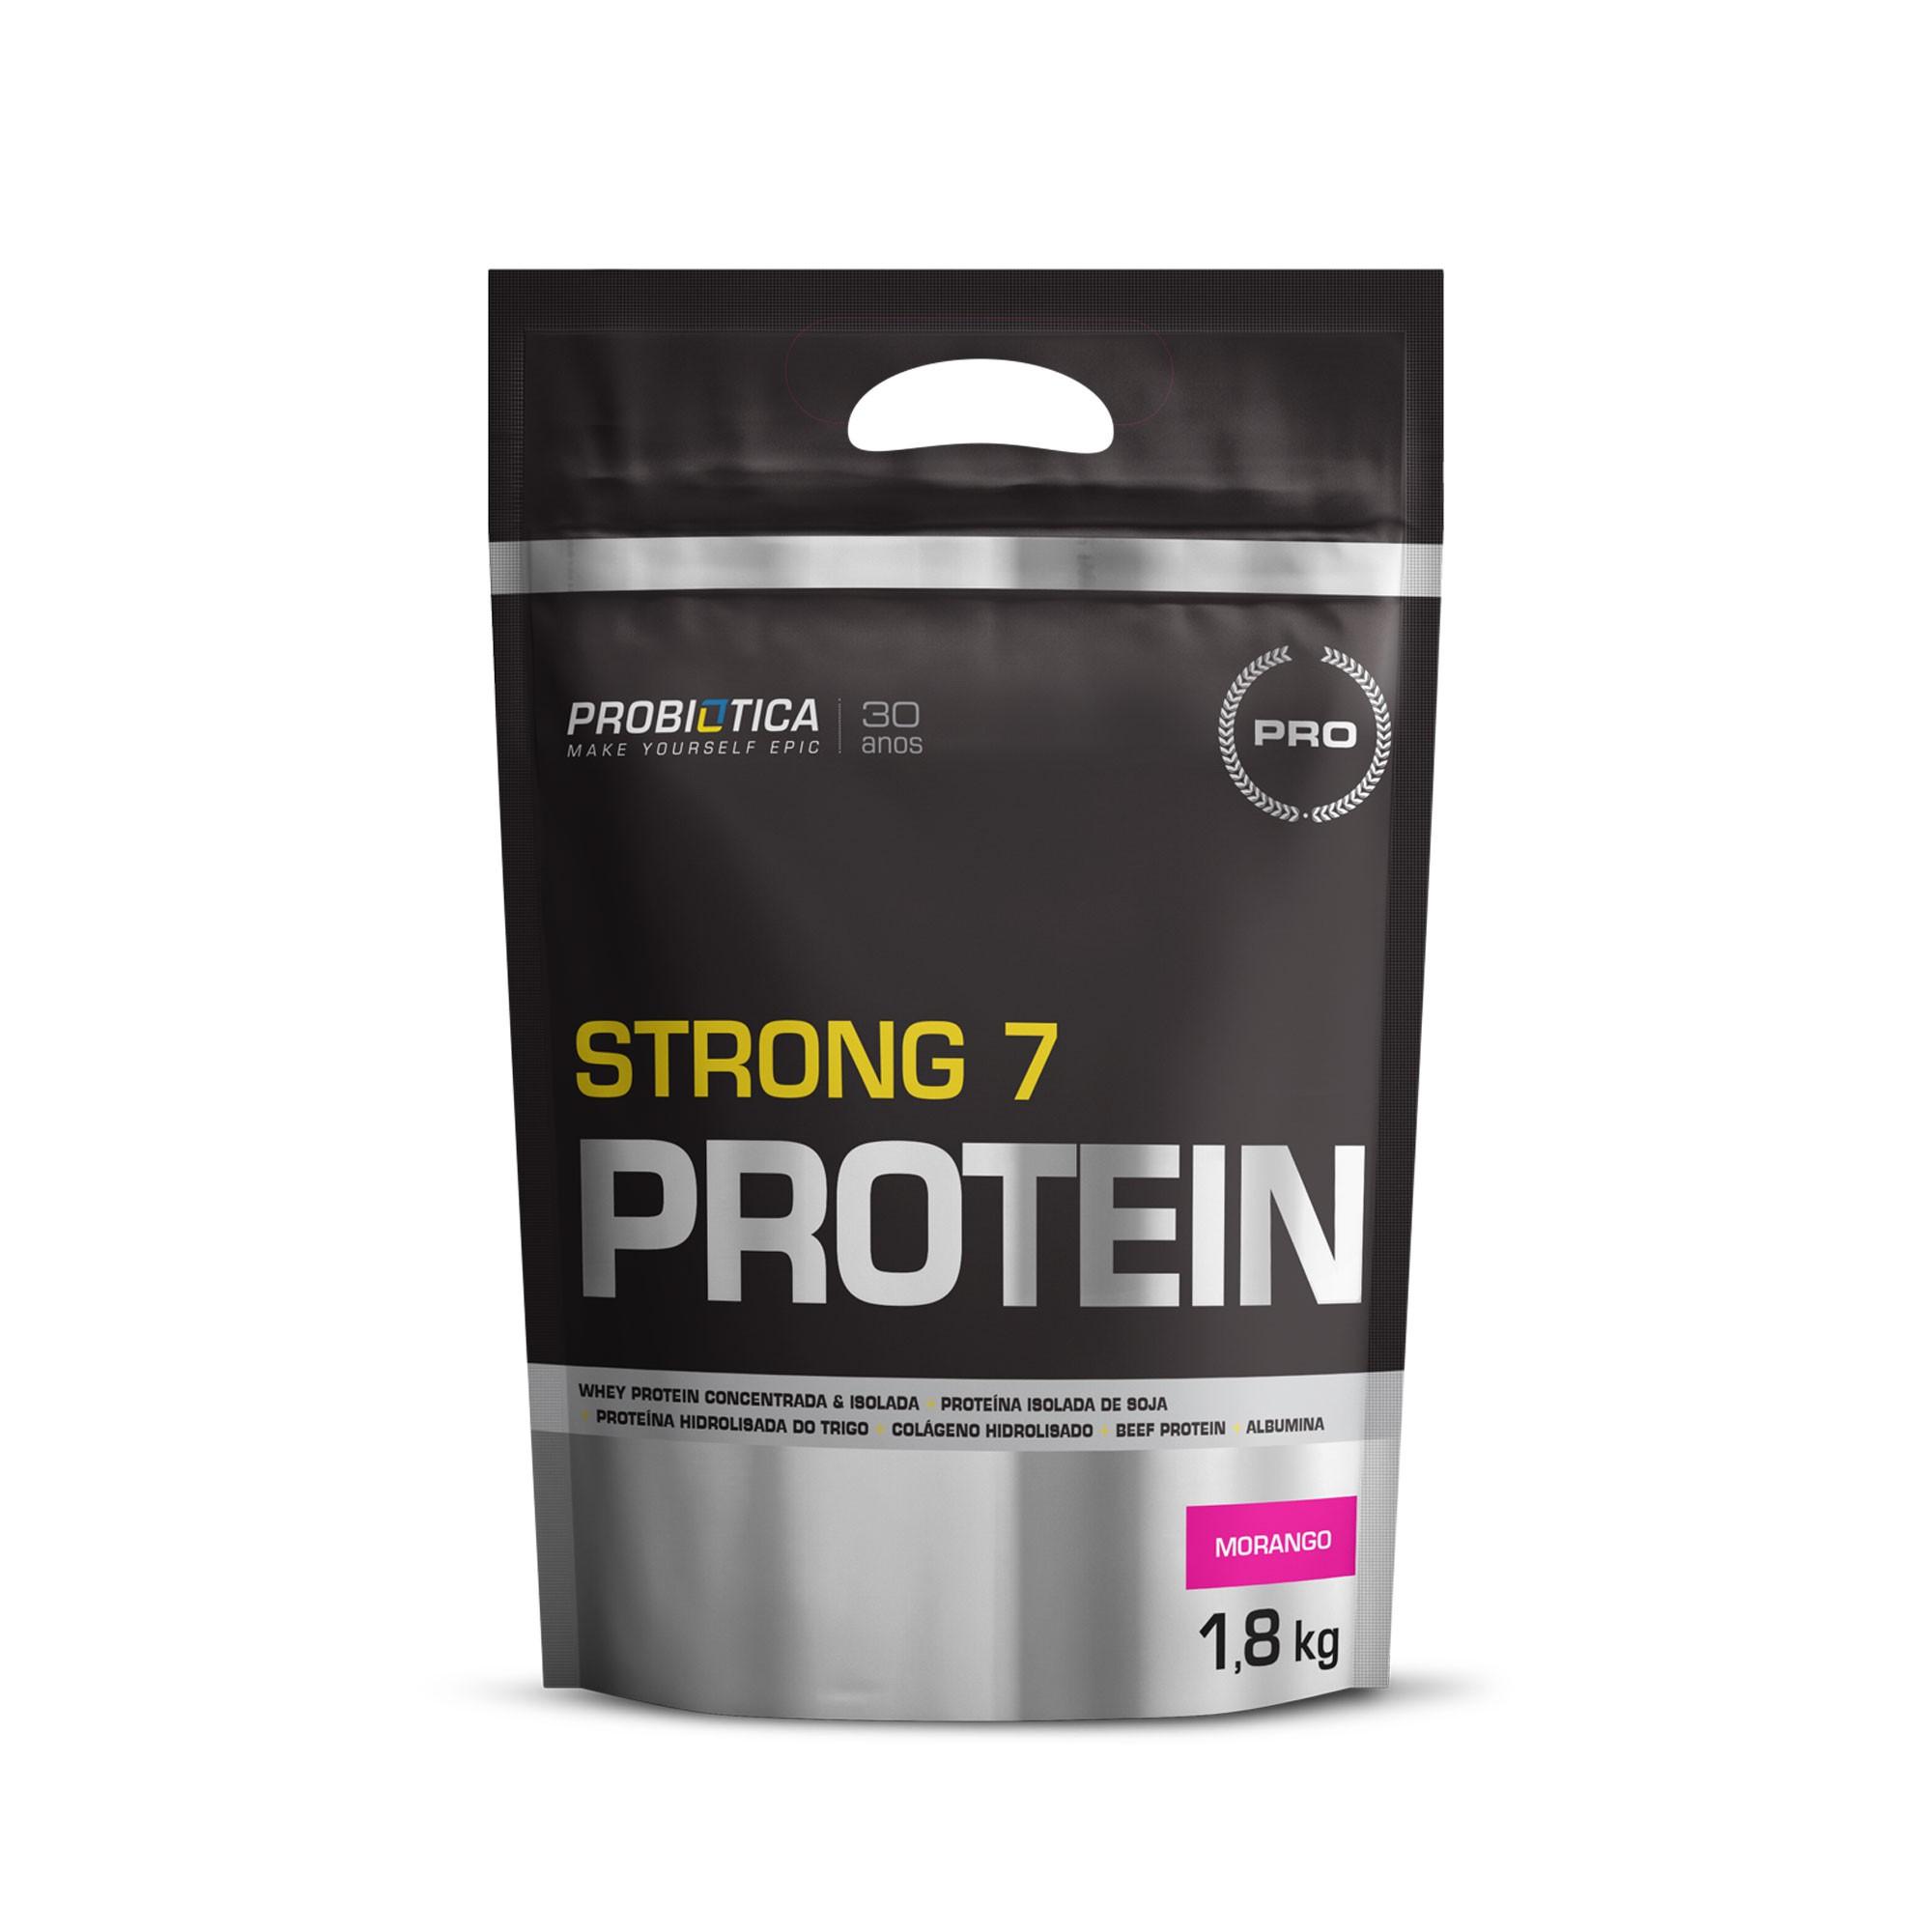 Strong 7 Protein Refil Morango Probiotica  1,8kg